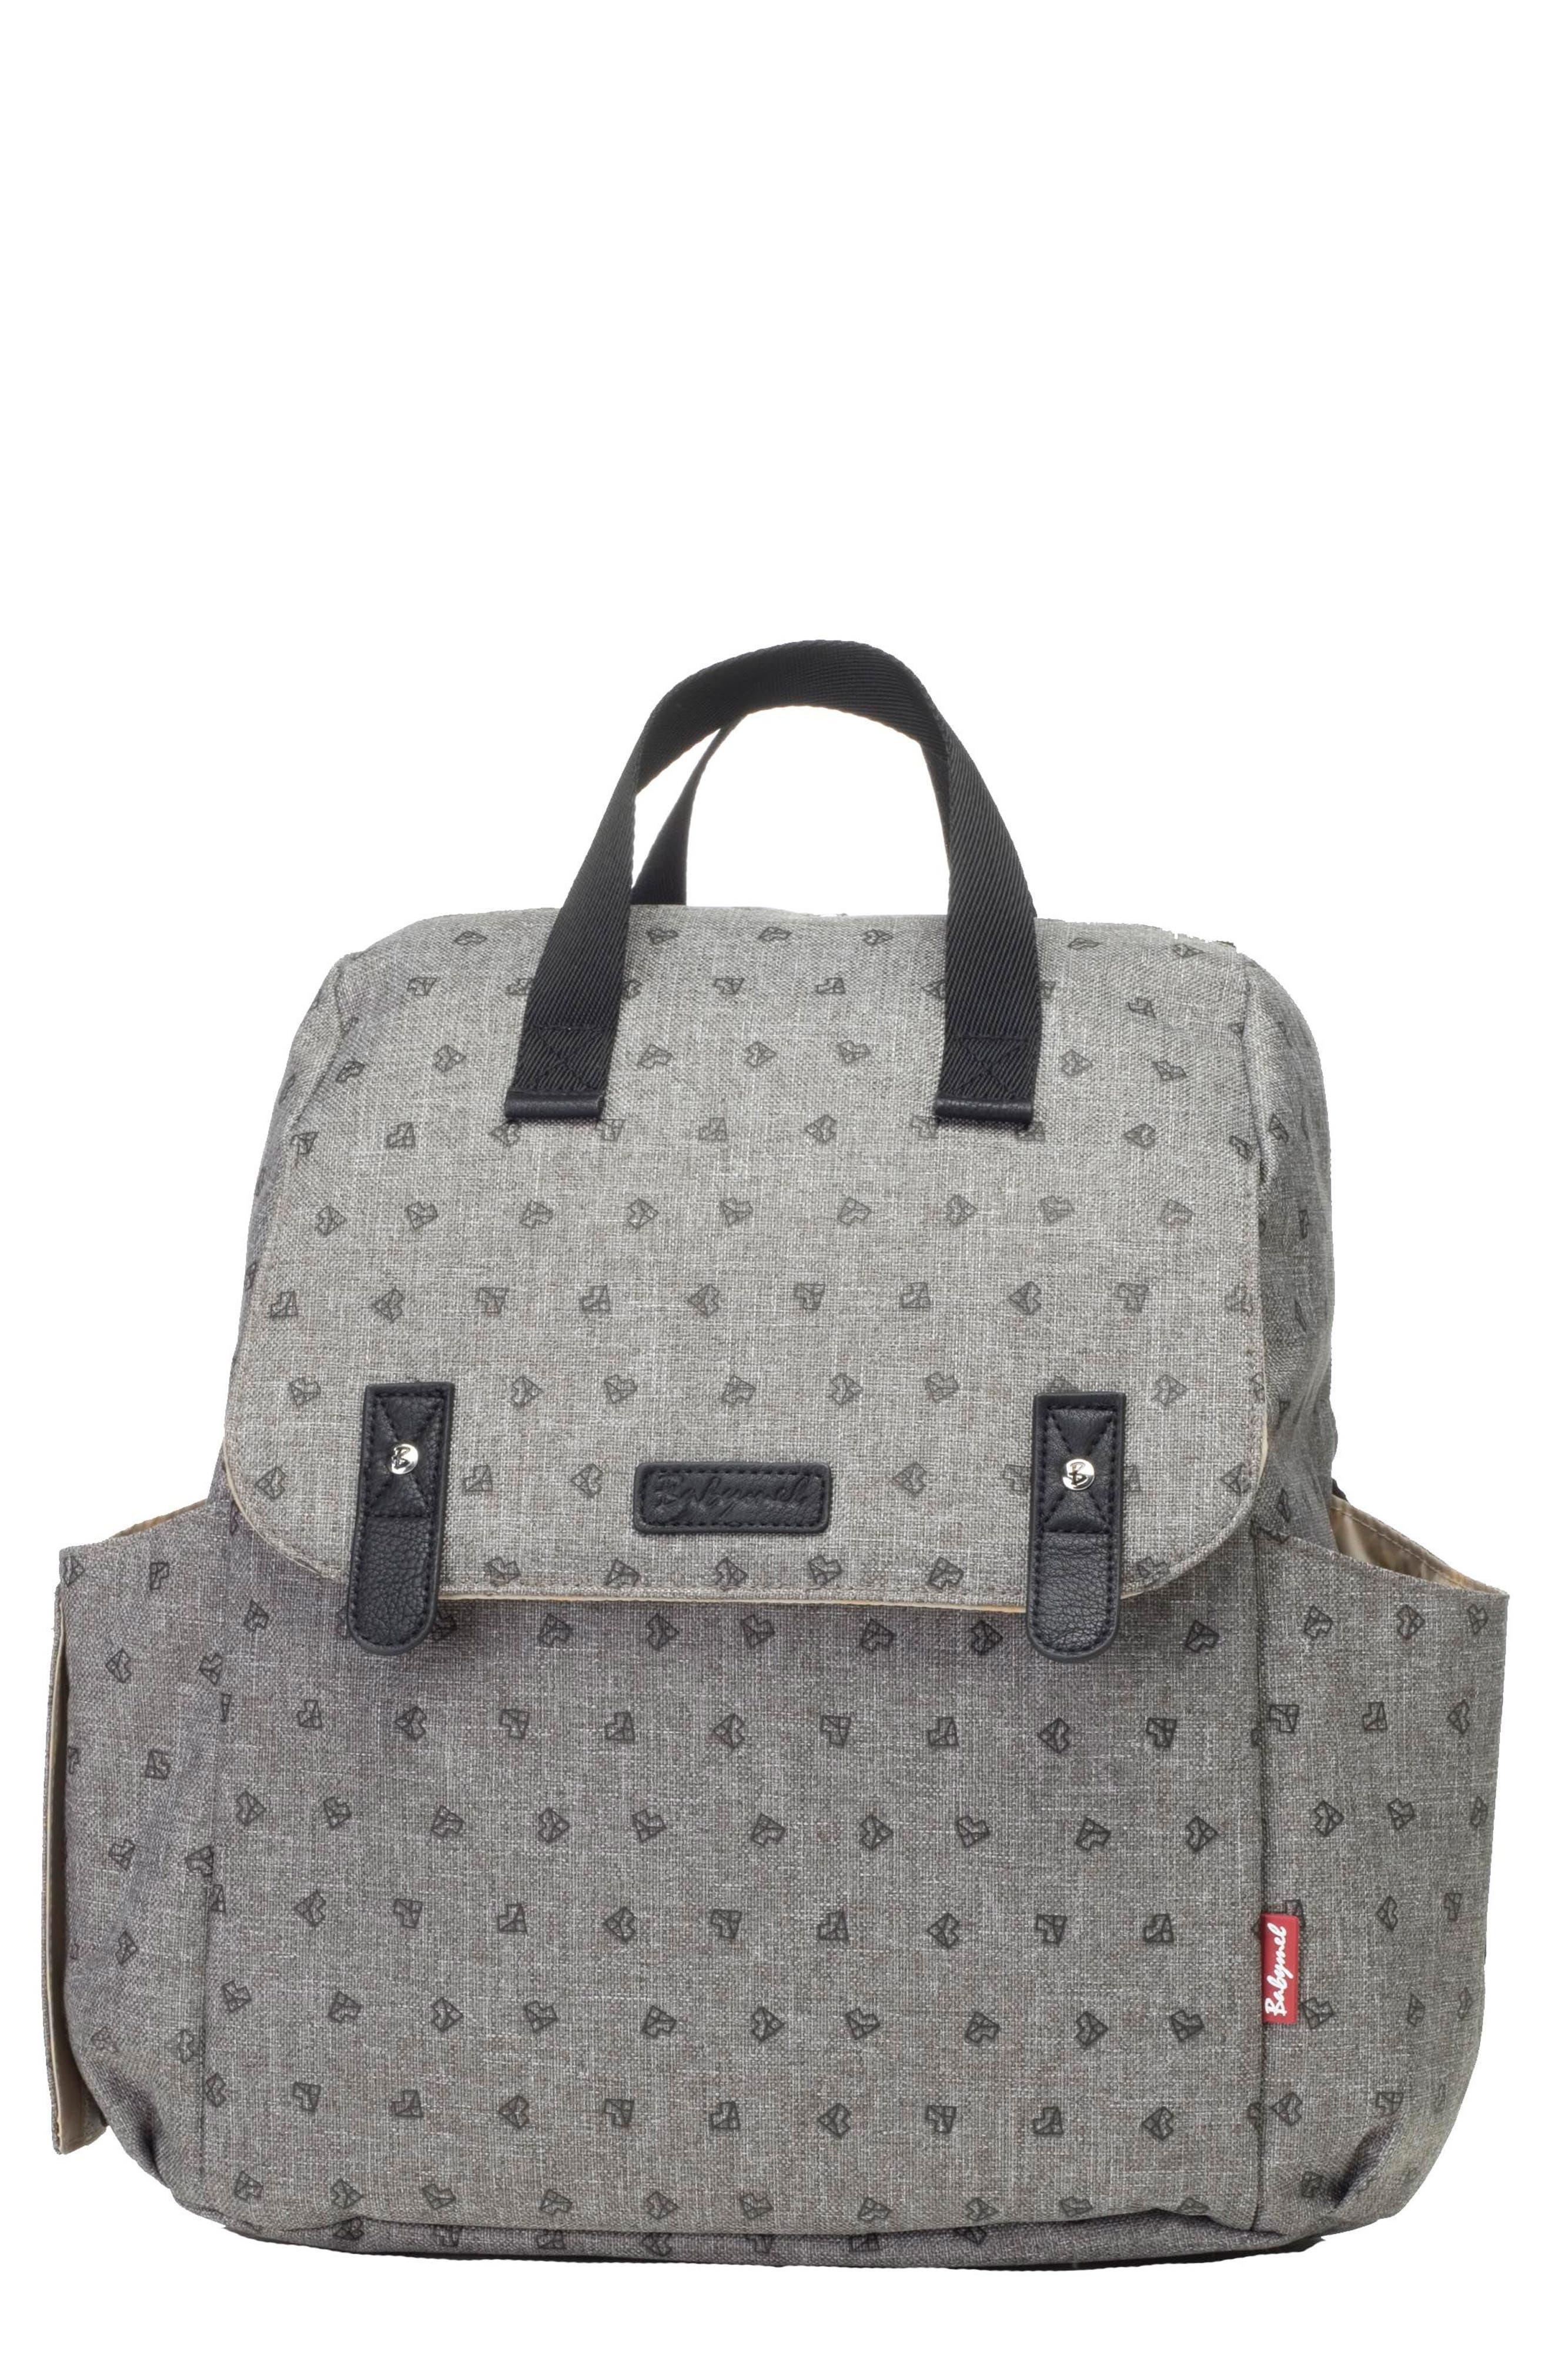 Alternate Image 1 Selected - Babymel Robyn Convertible Diaper Backpack